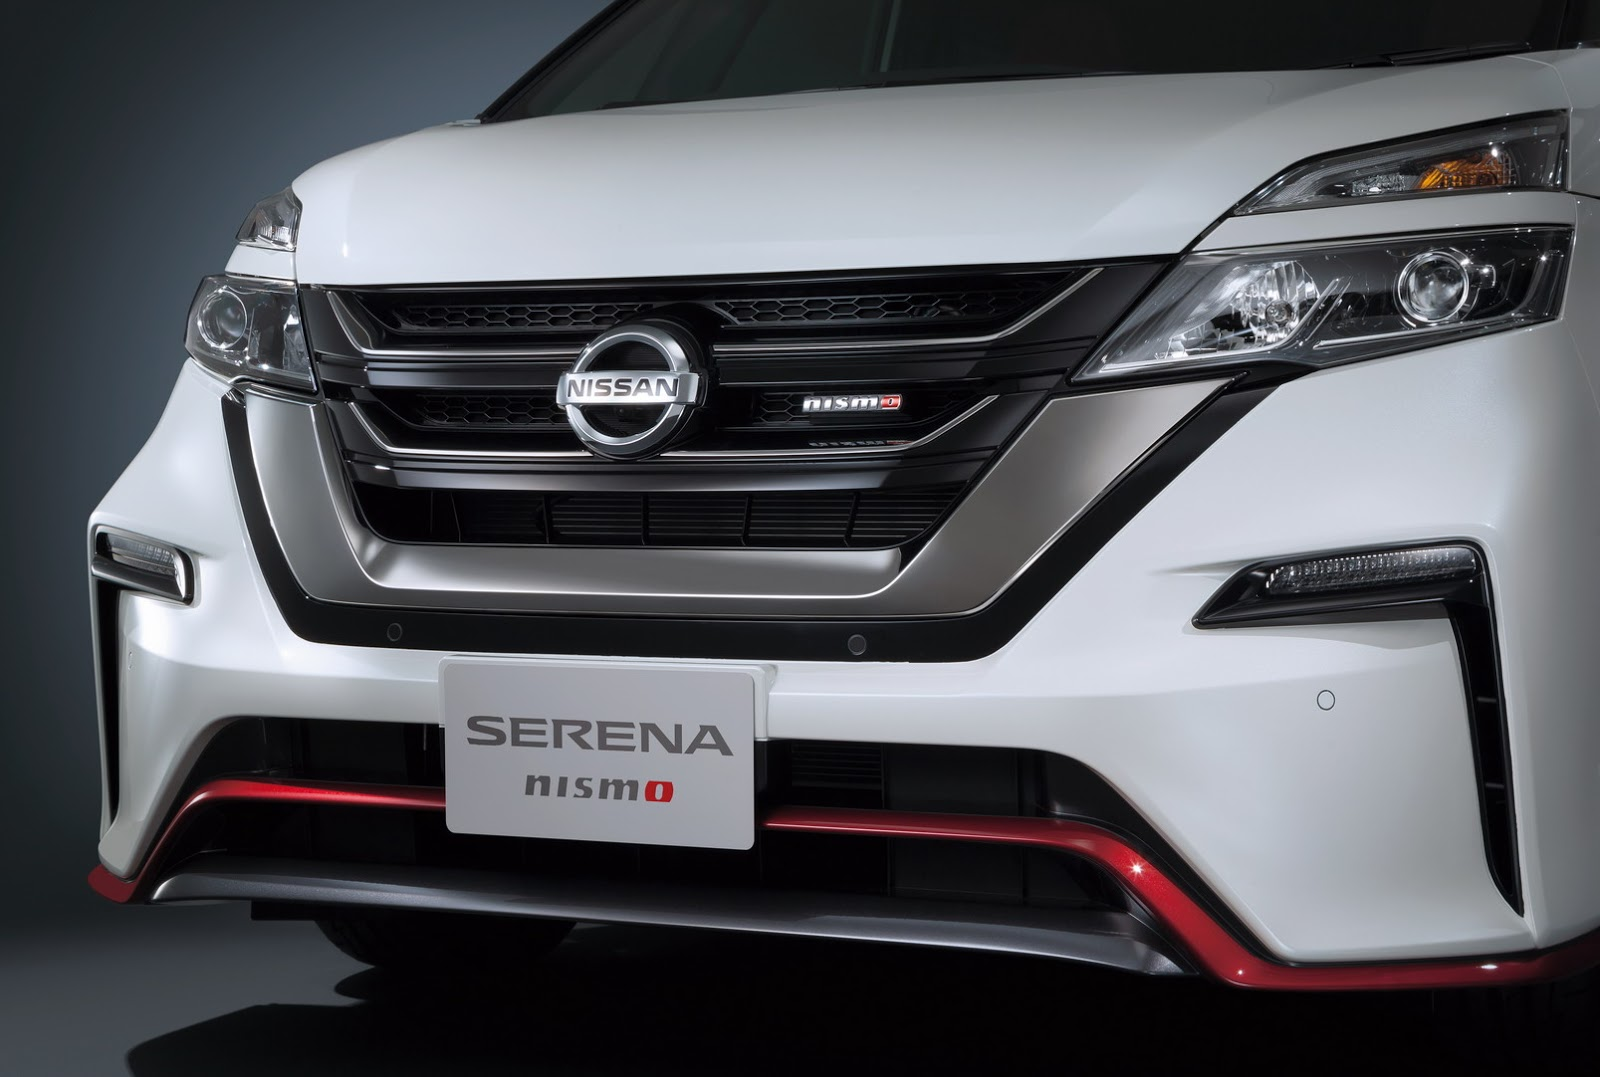 Nissan_Serena_Nismo_12